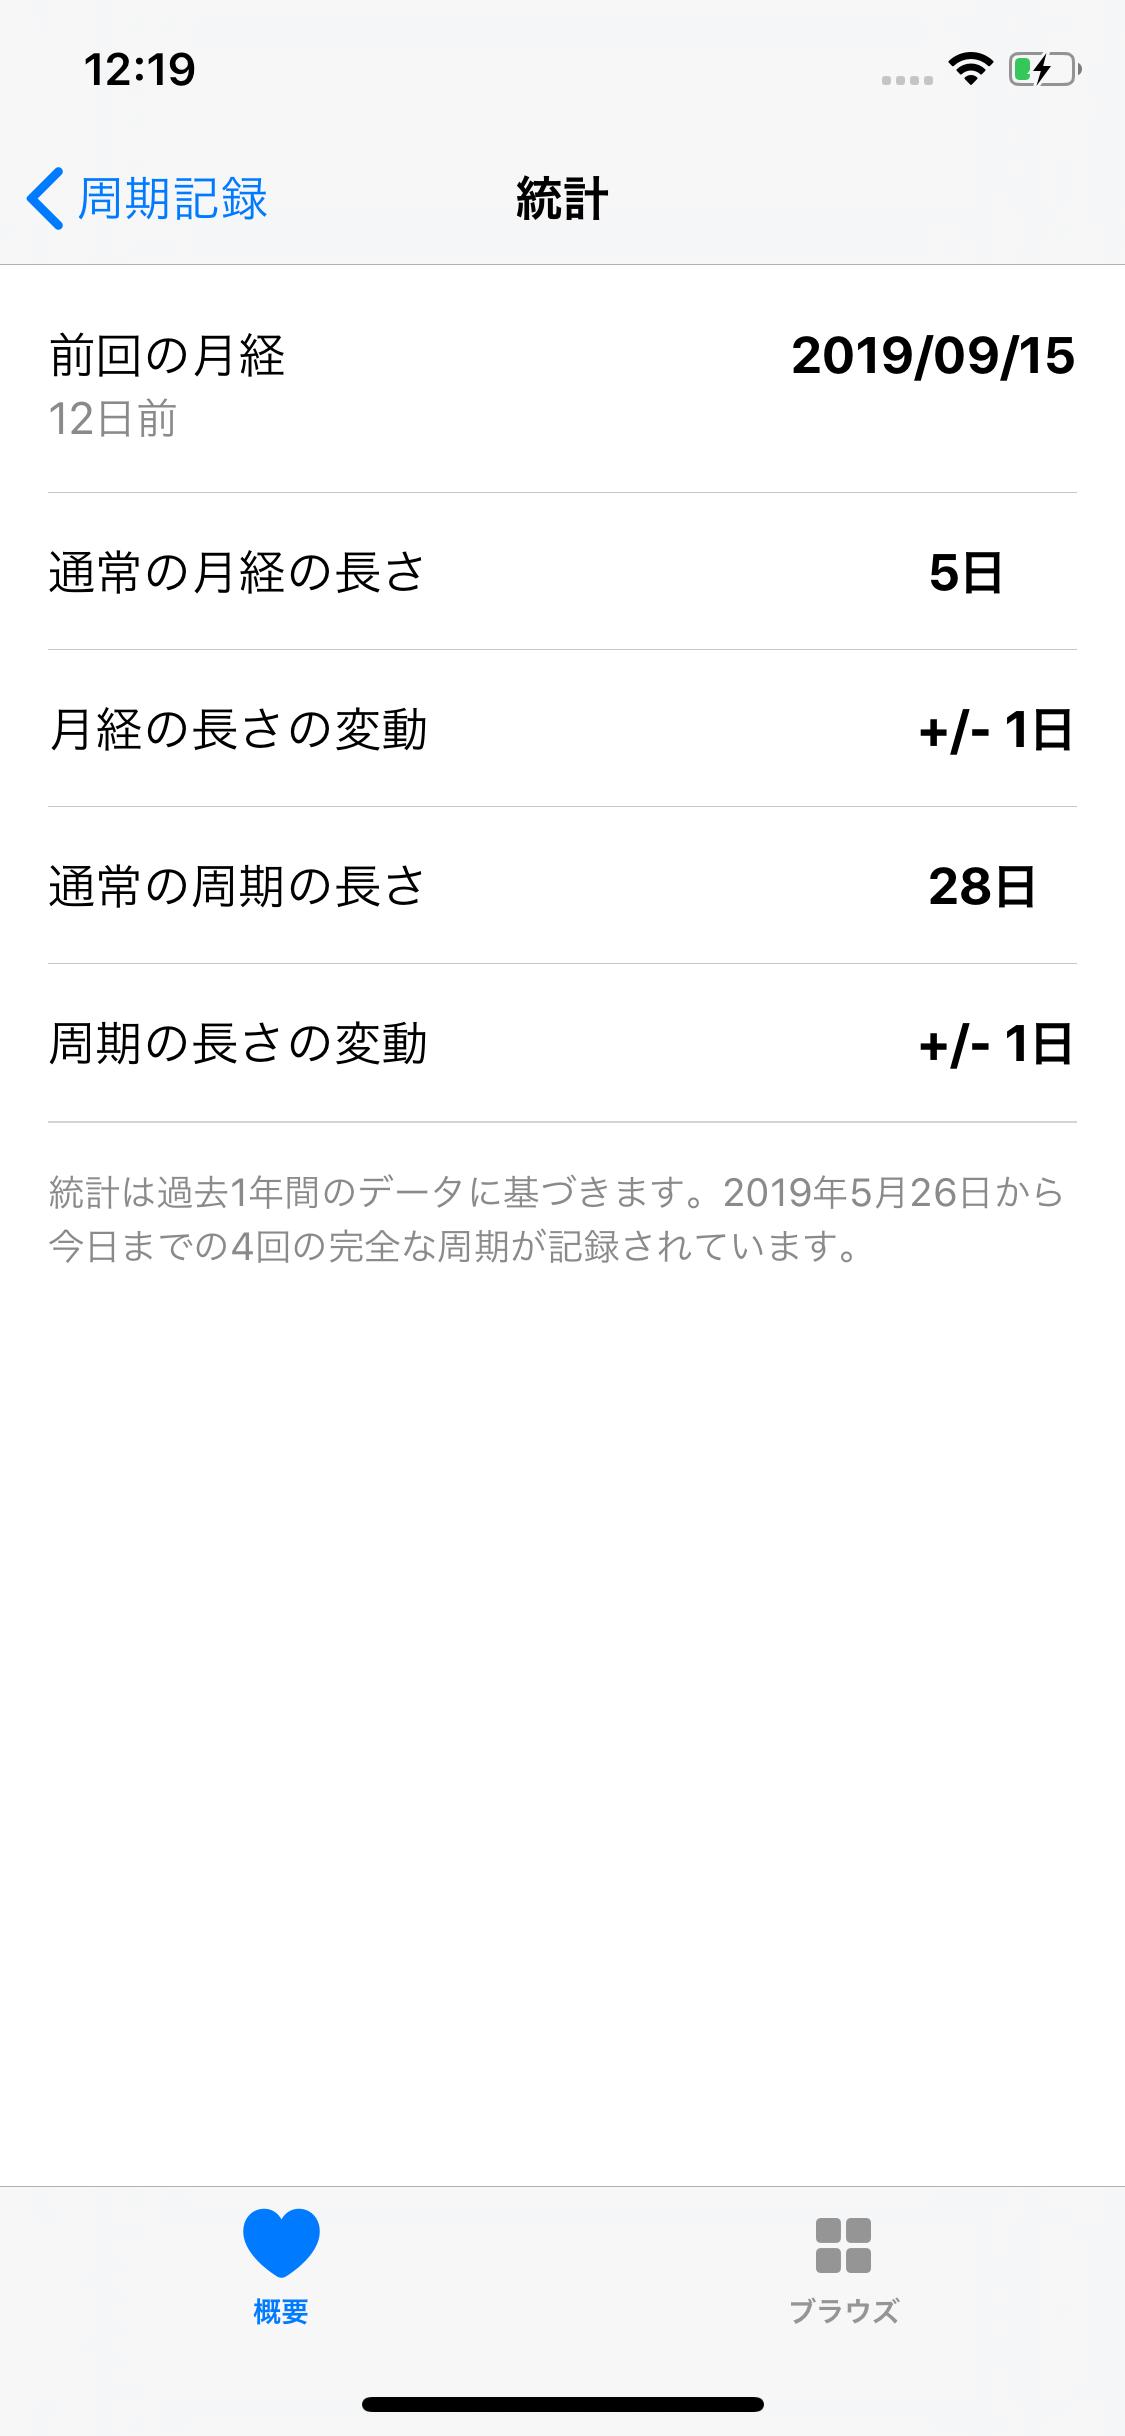 【iOS 13】iPhoneで月経周期を管理する方法。標準アプリで次回の予測ができる!